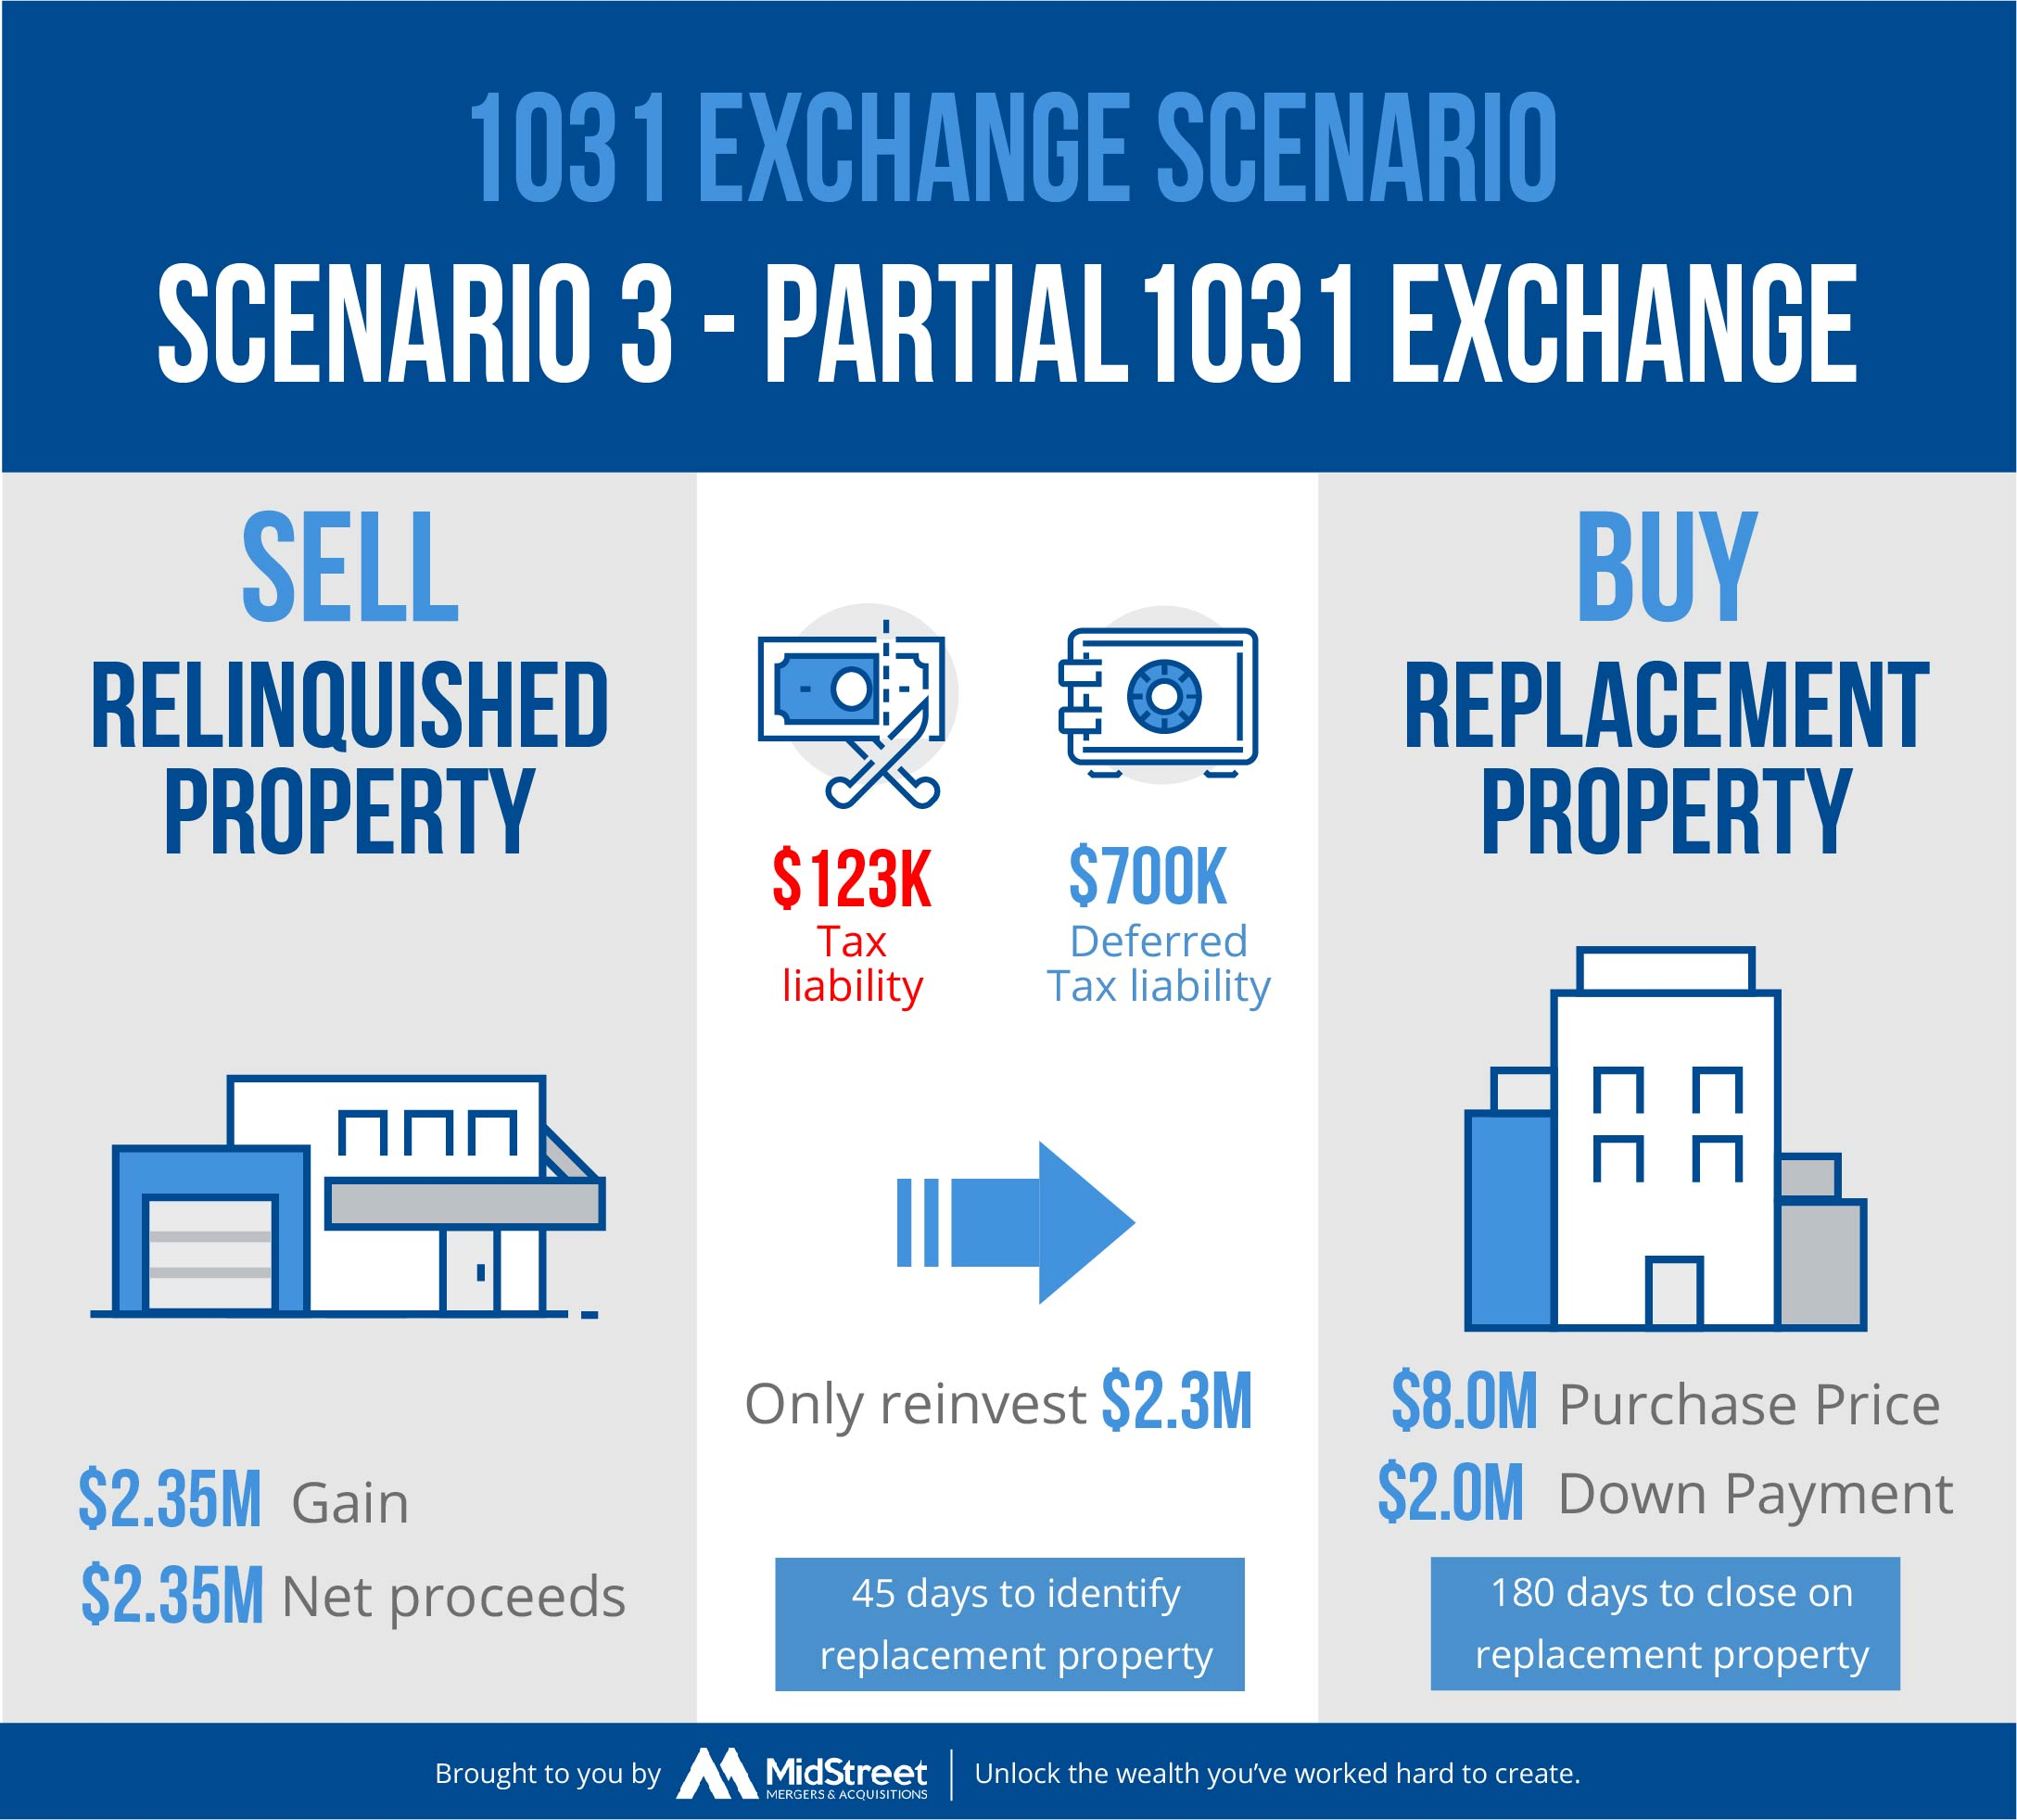 1031-Exchange Scenario 3